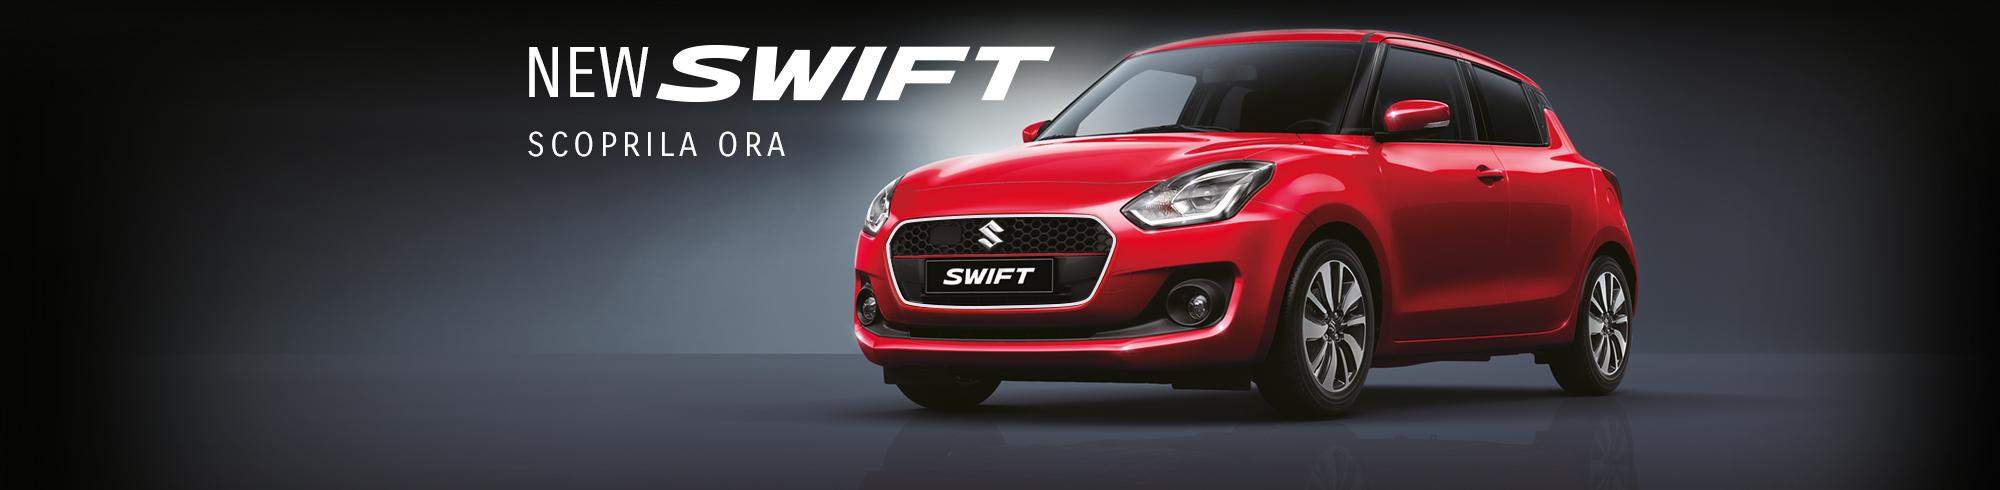 2017-03 SWIFT 03